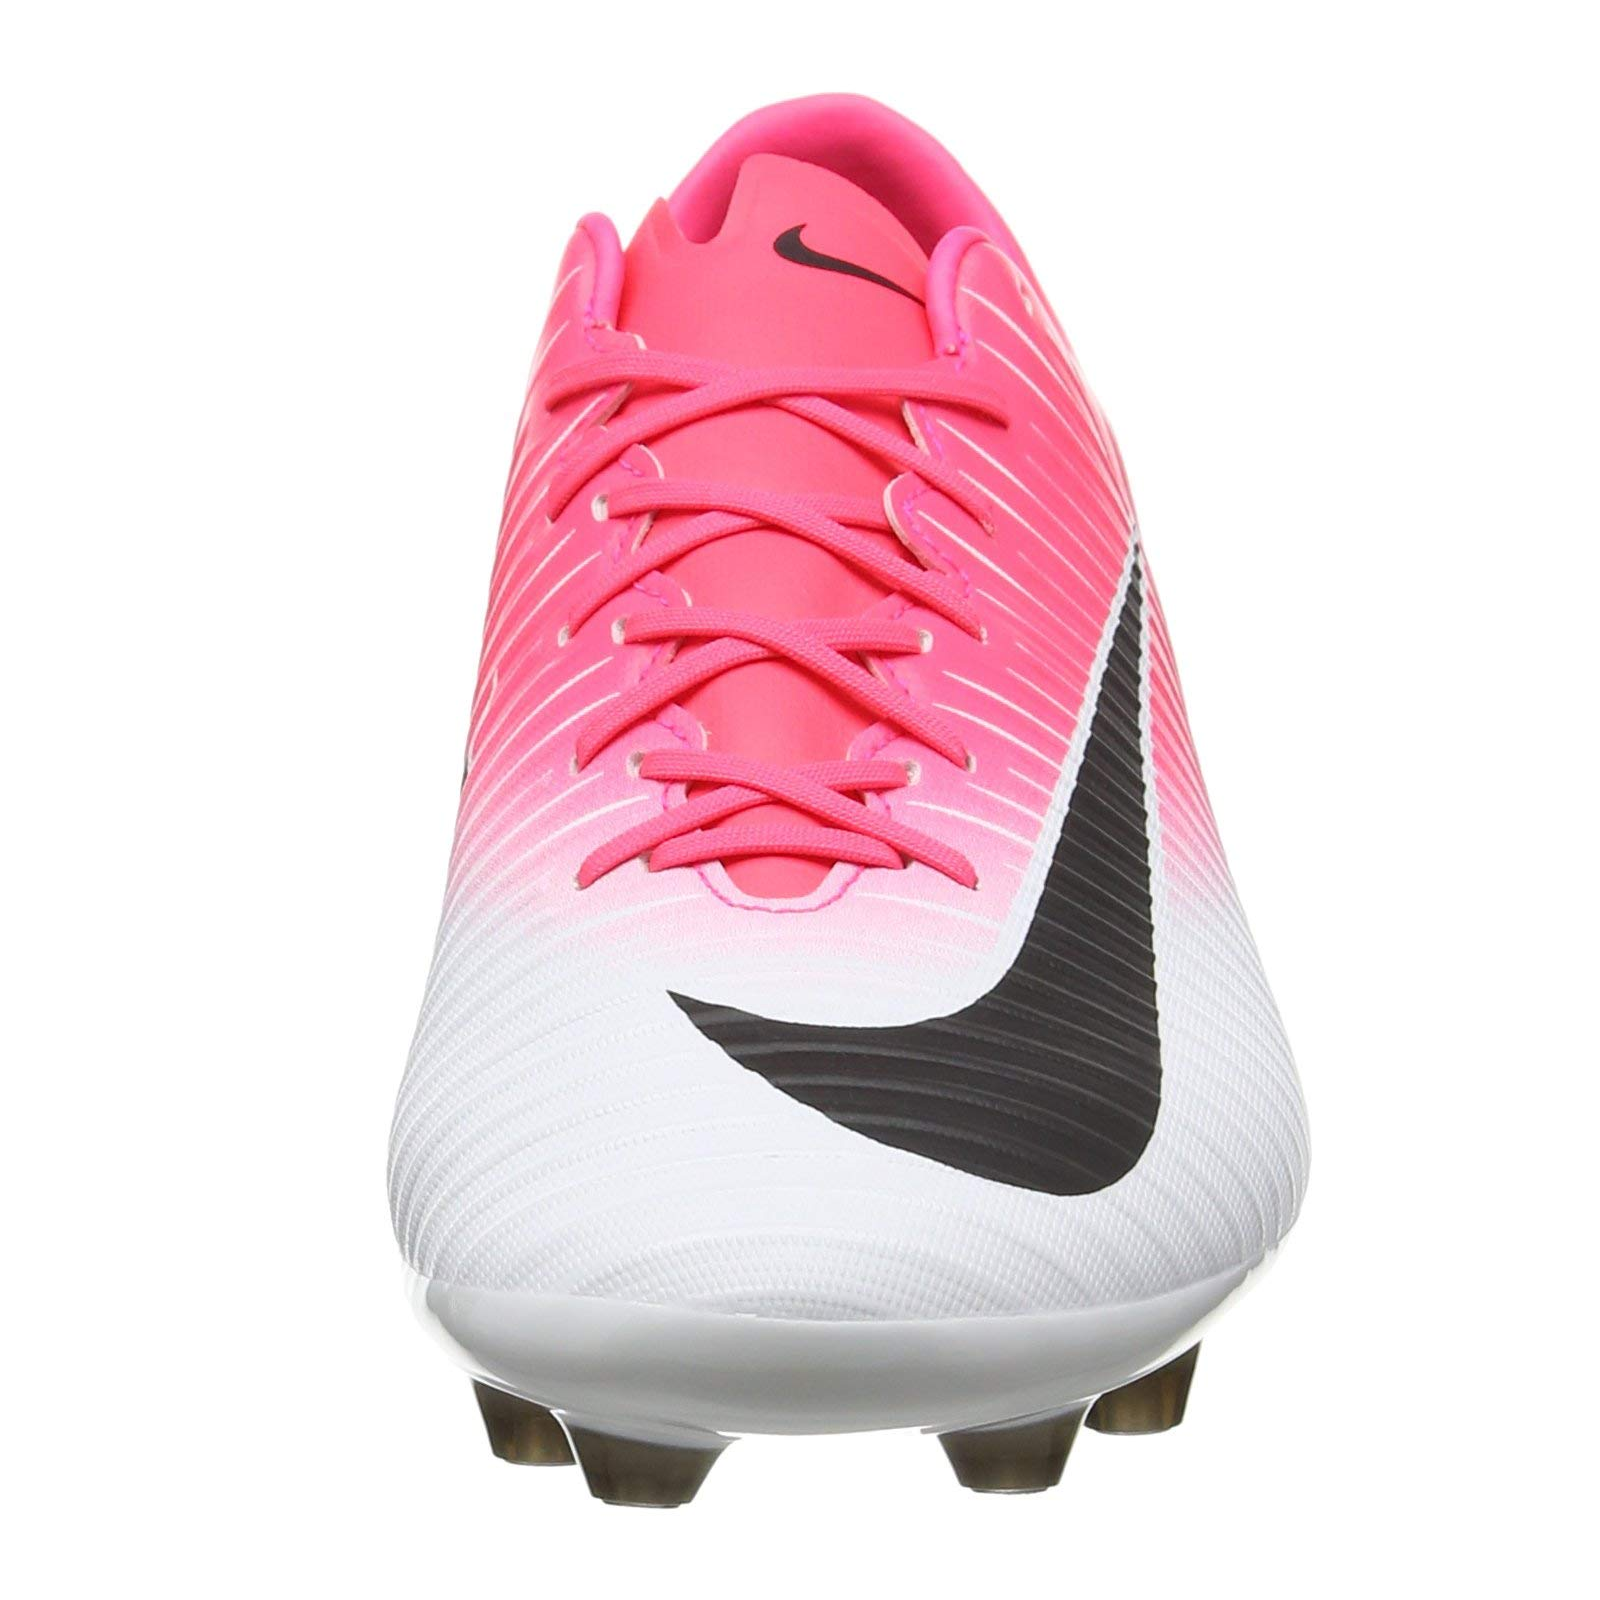 52ee0850c Nike Mercurial Veloce III AG PRO Fußballschuhe pink/weiss/schwarz 850793-601